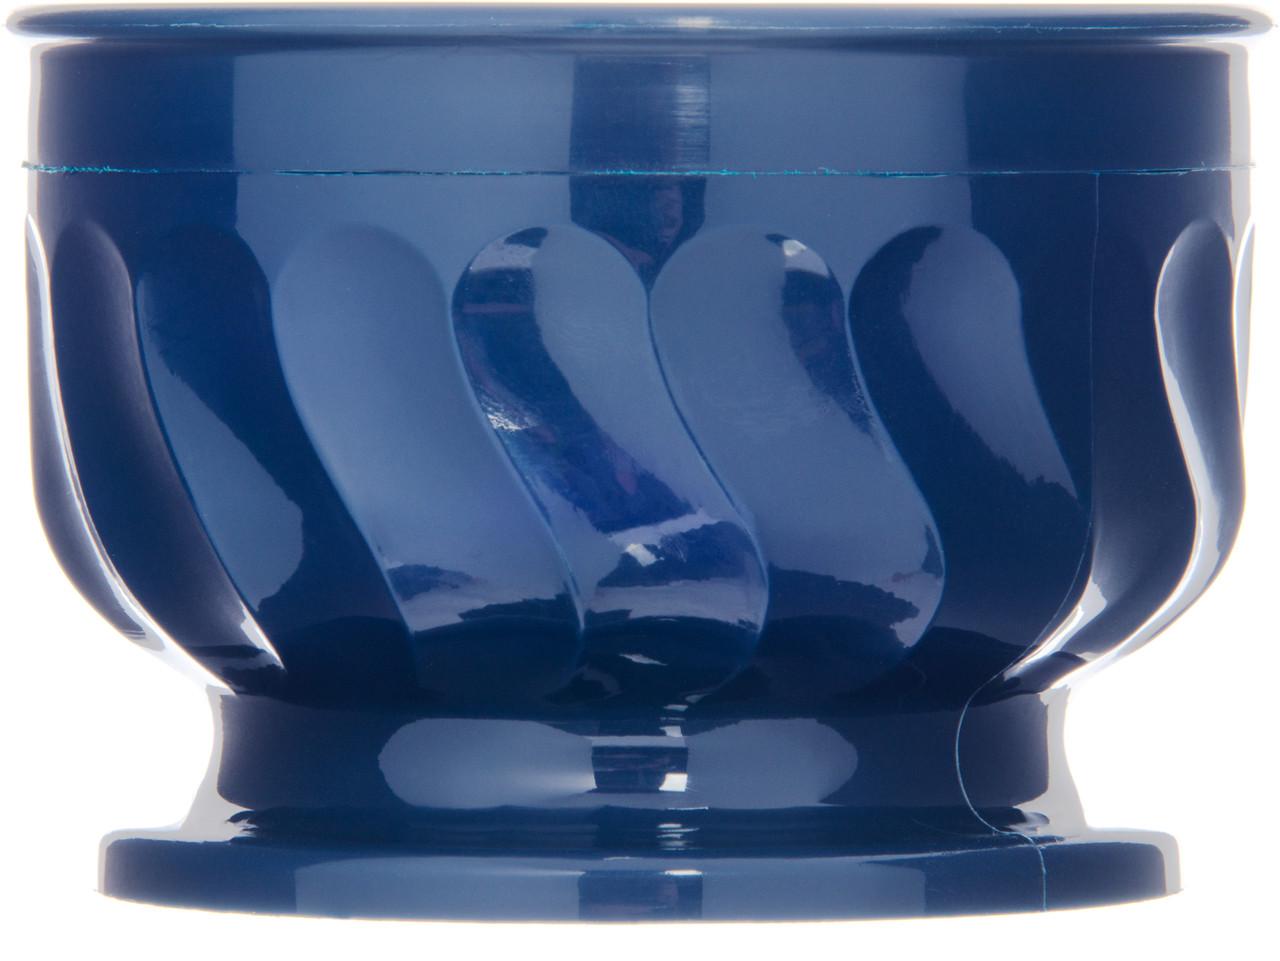 Pedestal Base Bowl, 9 oz., insulated, Turnbury®, Midnight blue (48 each per case) (3300/28)